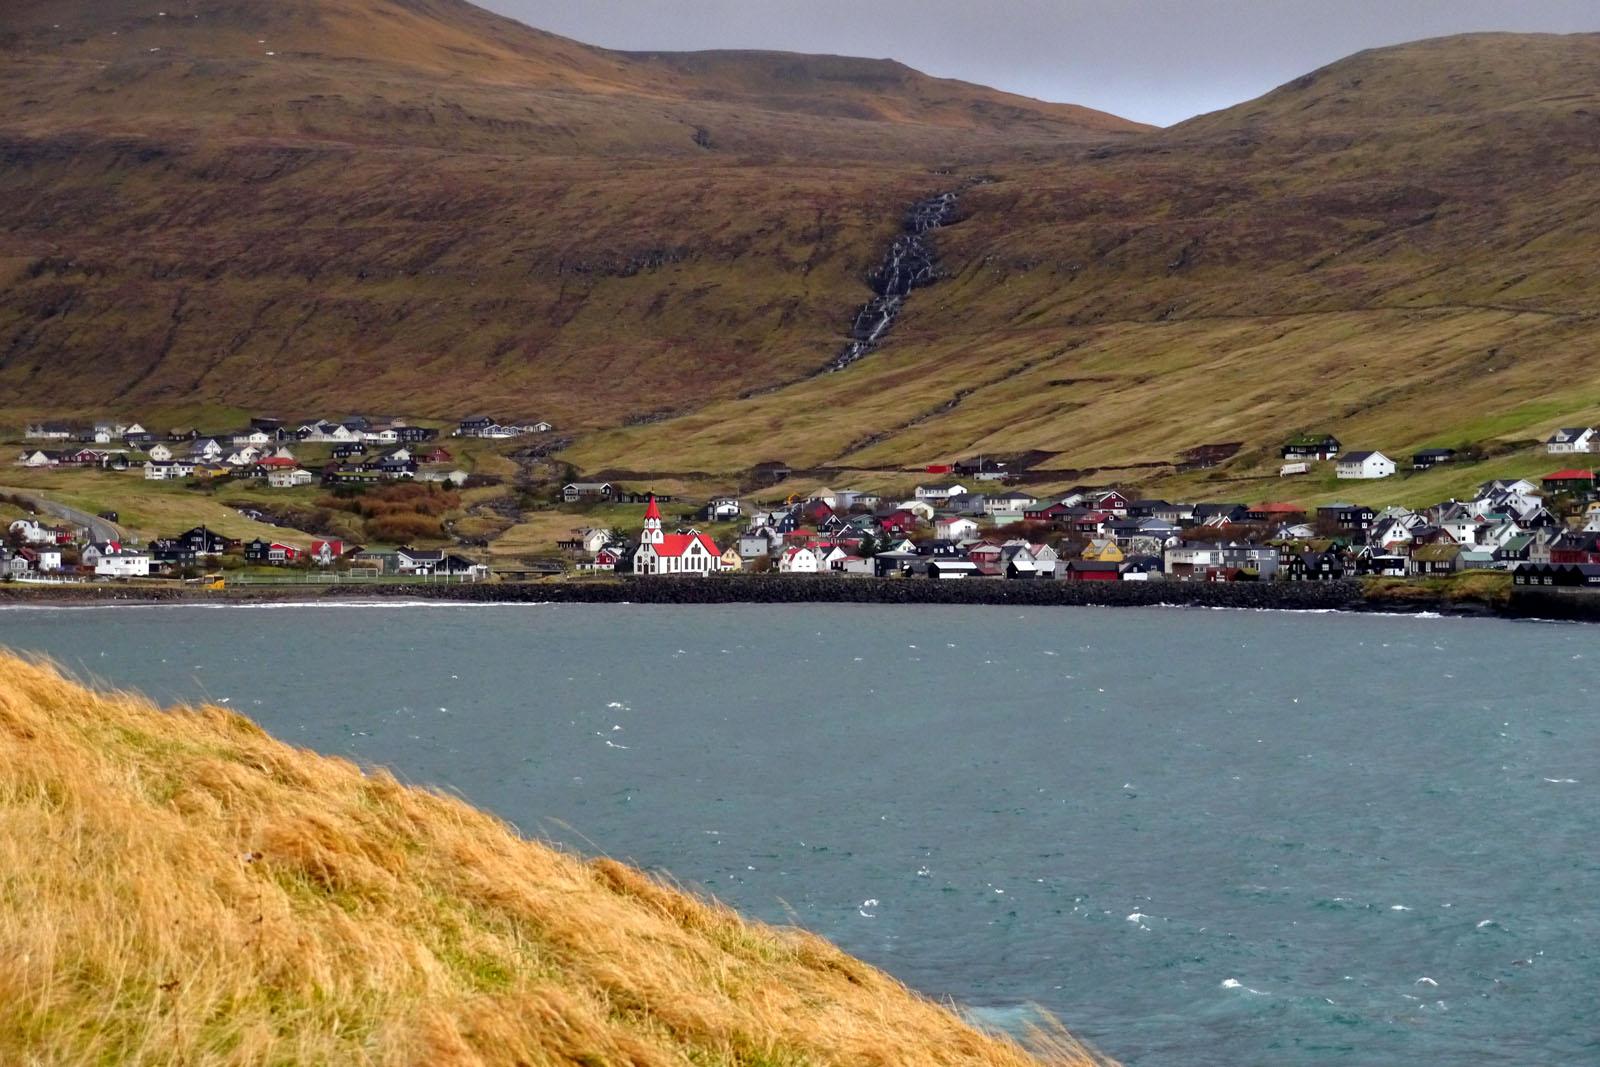 Sandavagur-Vagar-Faroer Inseln-Ortschaft-Wasserfall